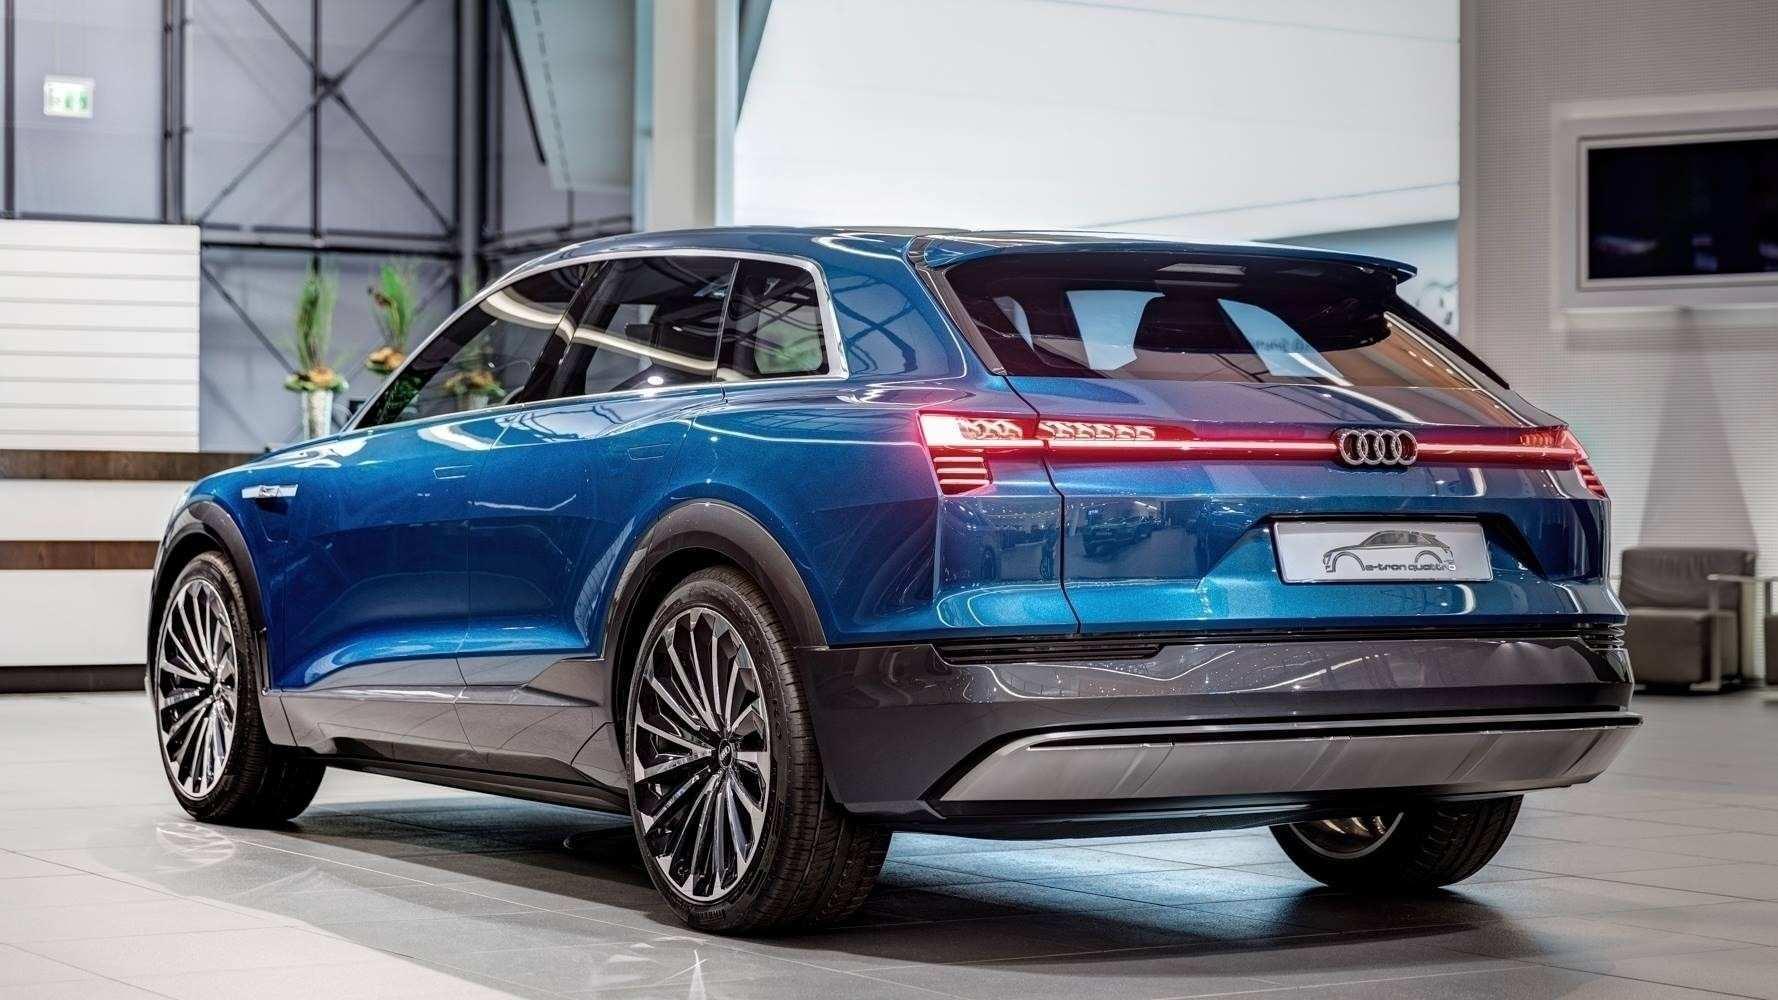 87 Great Audi Novita 2019 Specs and Review with Audi Novita 2019